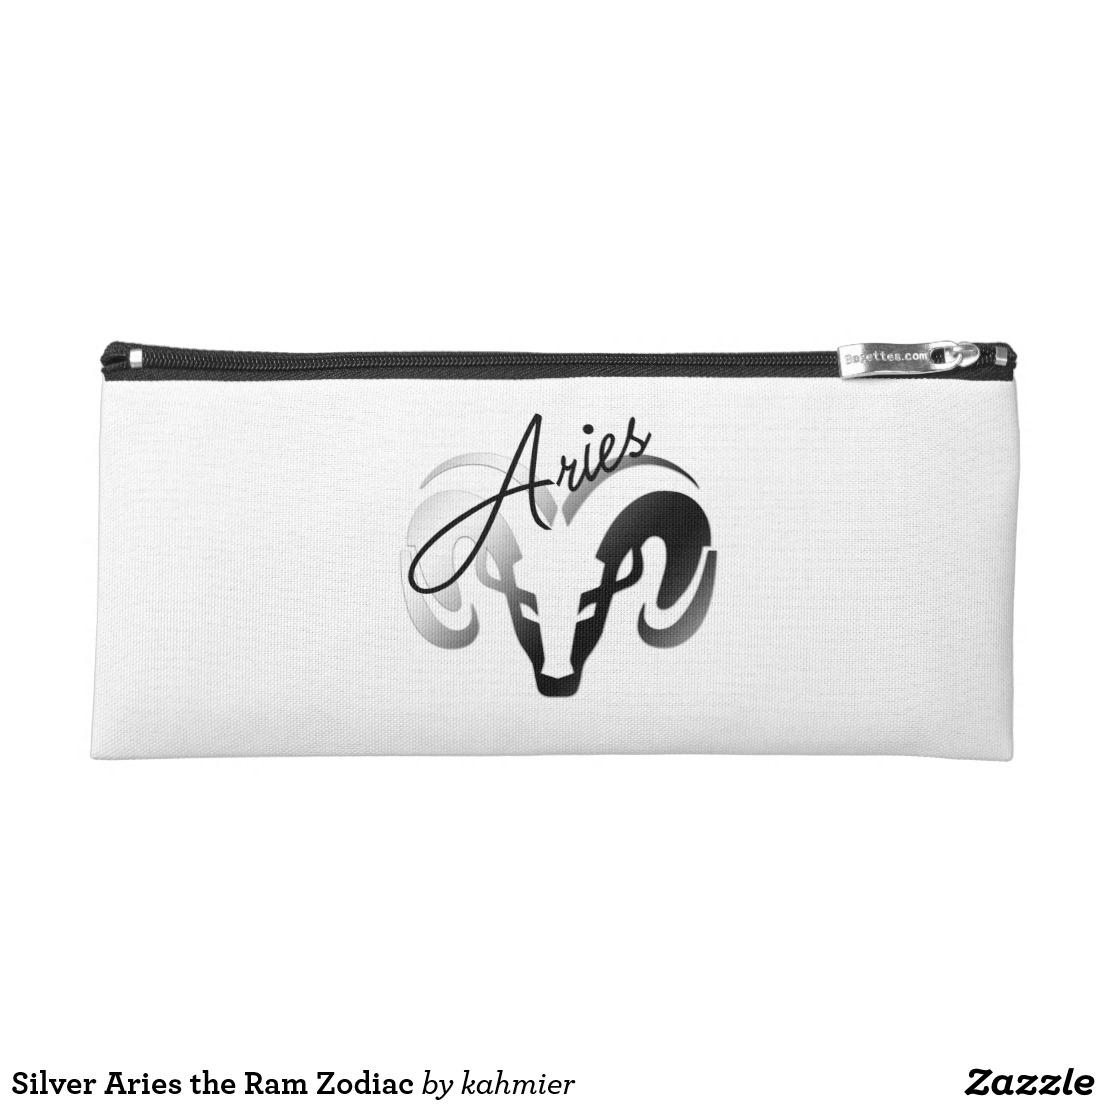 Silver Aries the Ram Zodiac Pencil Case